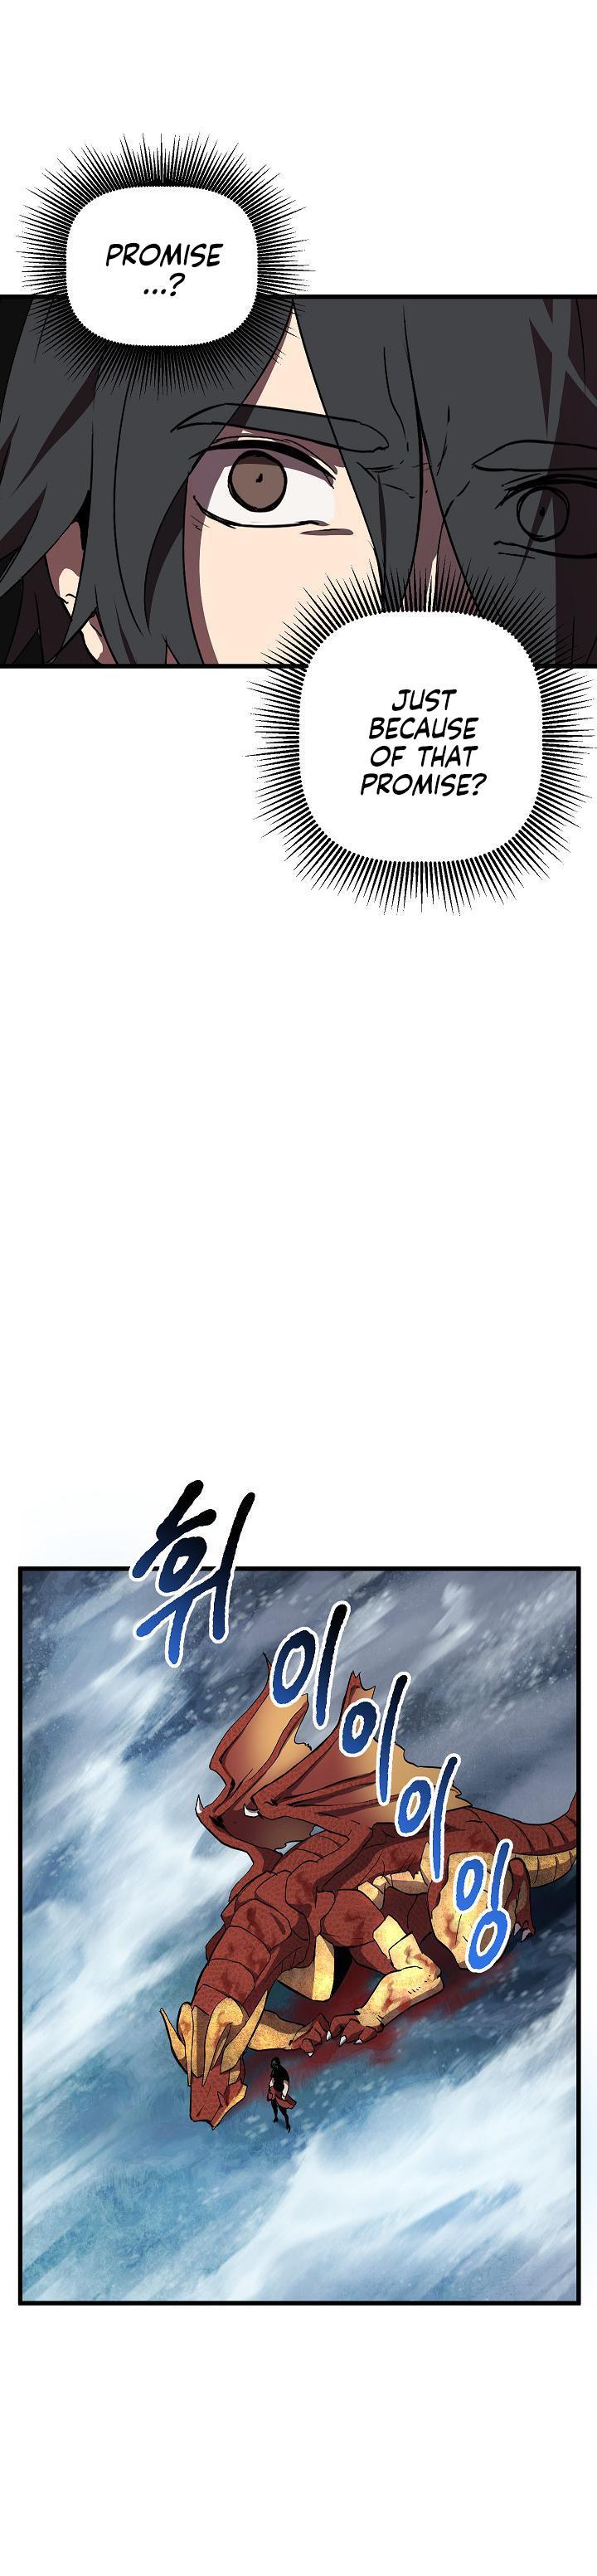 Survival Story Of A Sword King In A Fantasy World Vol.1 Chapter 19 page 12 - Mangakakalots.com